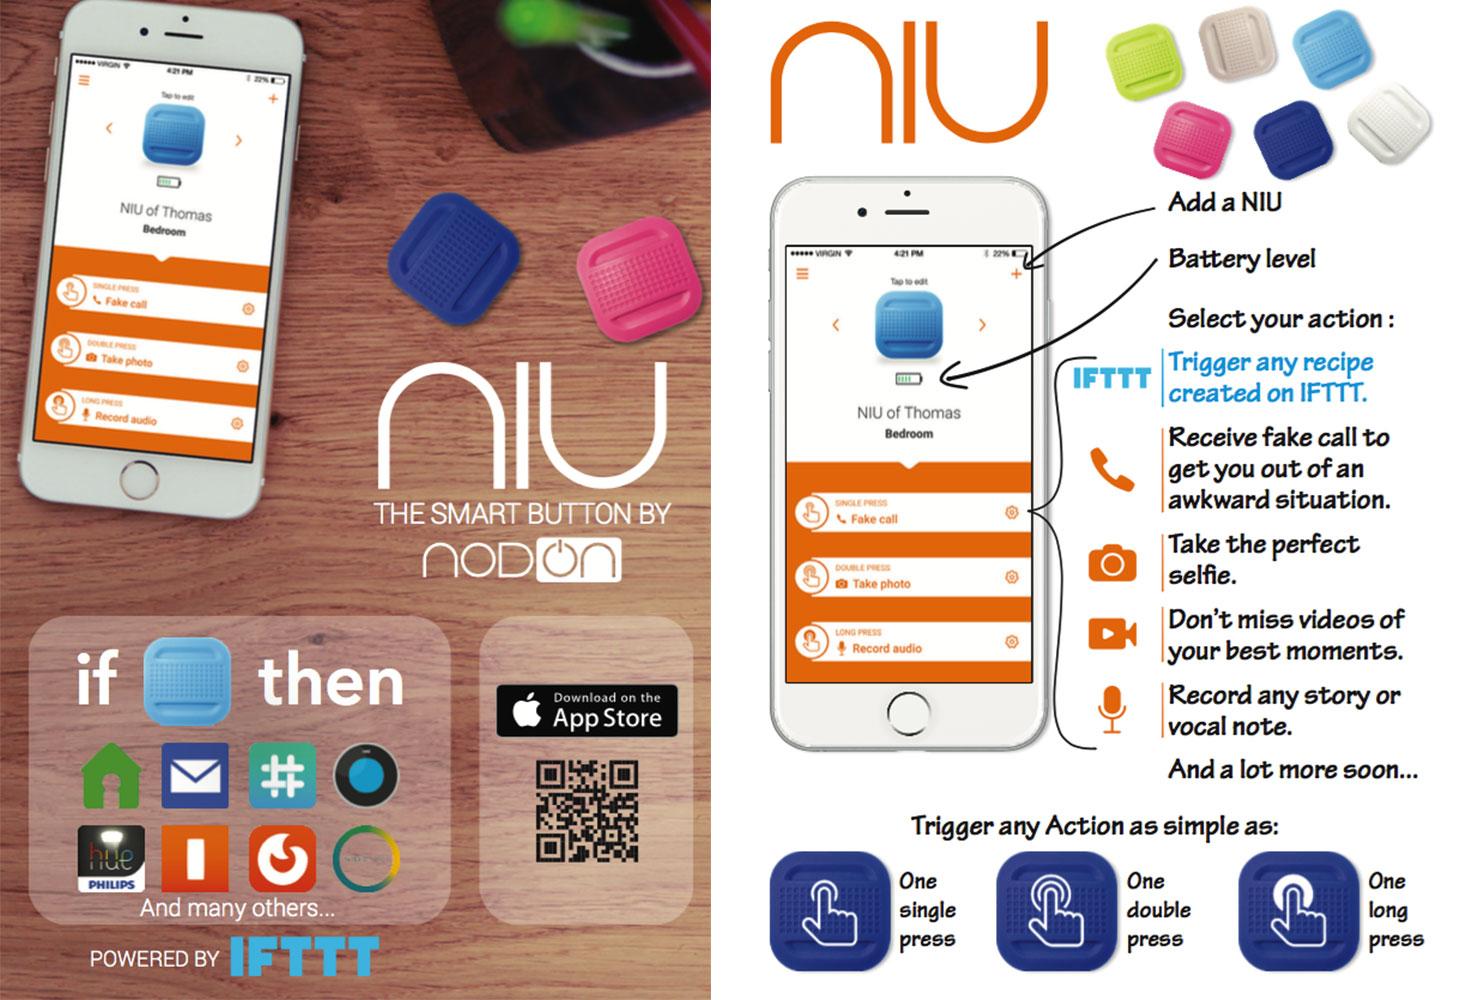 NIU télécommande smartphone compatible Bluetooth et IFTTT